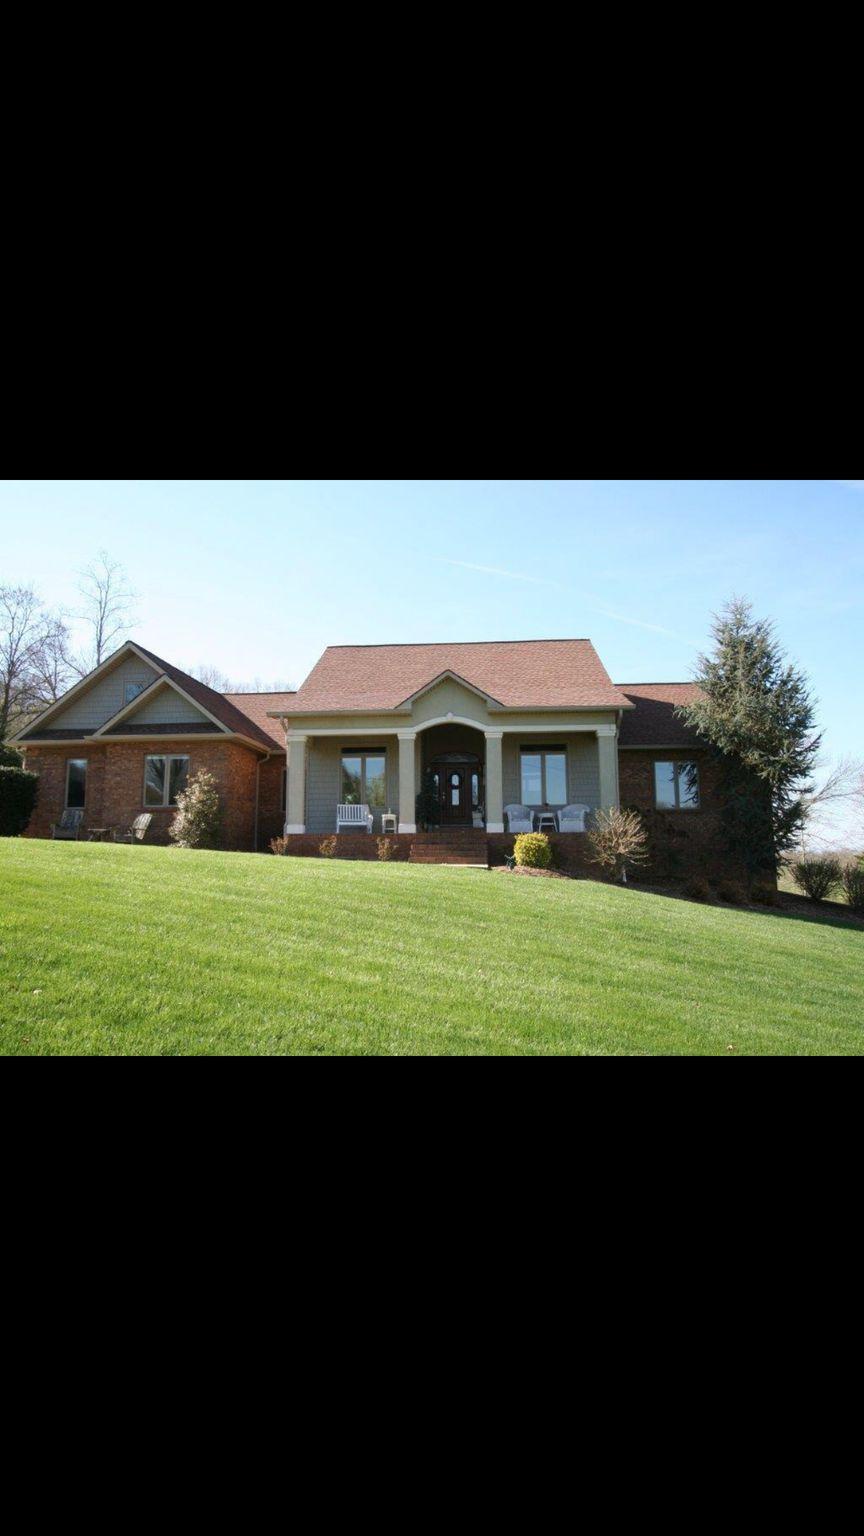 693 Shadden Rd Gray Tn 37615 4 Bed 5 Bath Single Family Home